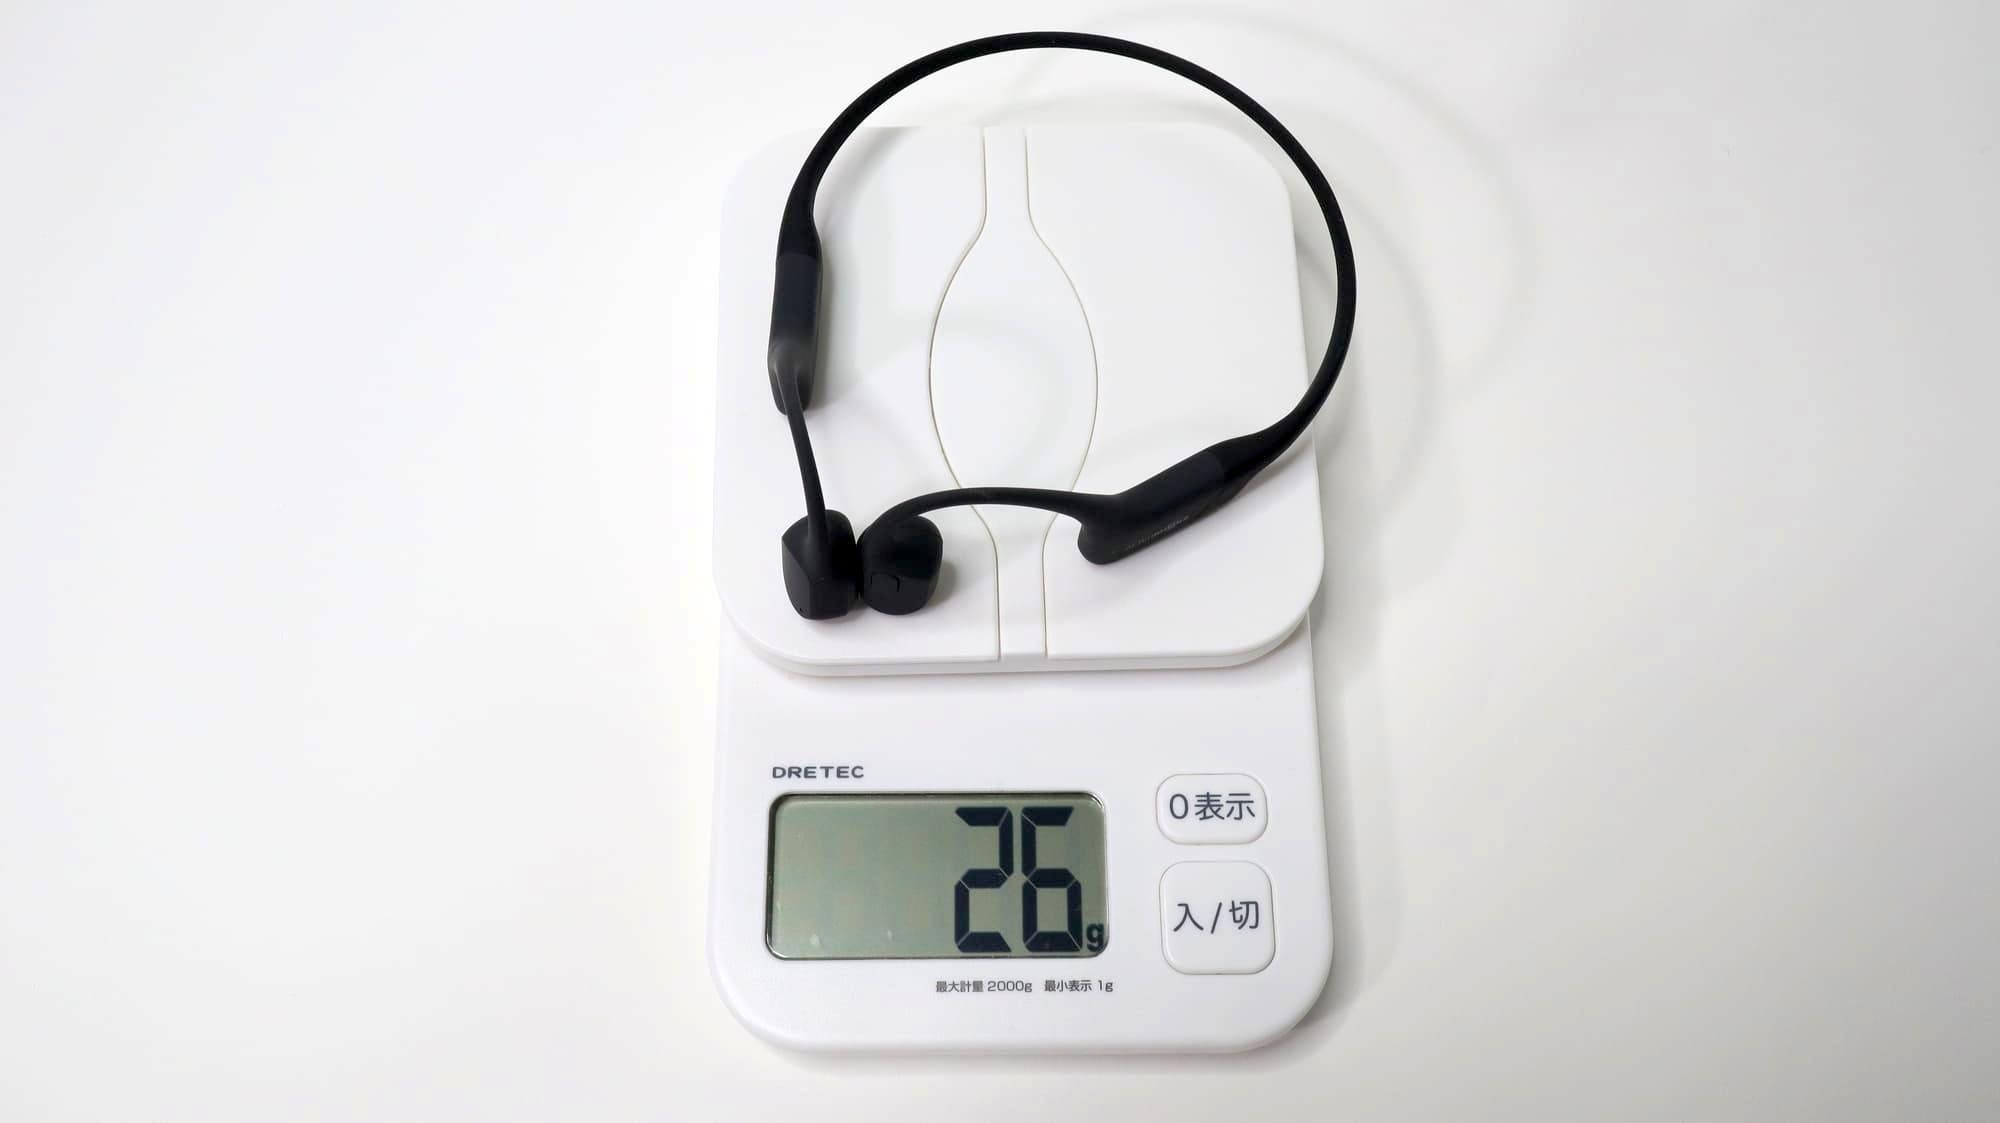 AfterShokz 骨伝導ワイヤレスヘッドホン テレビ用の重さは26g